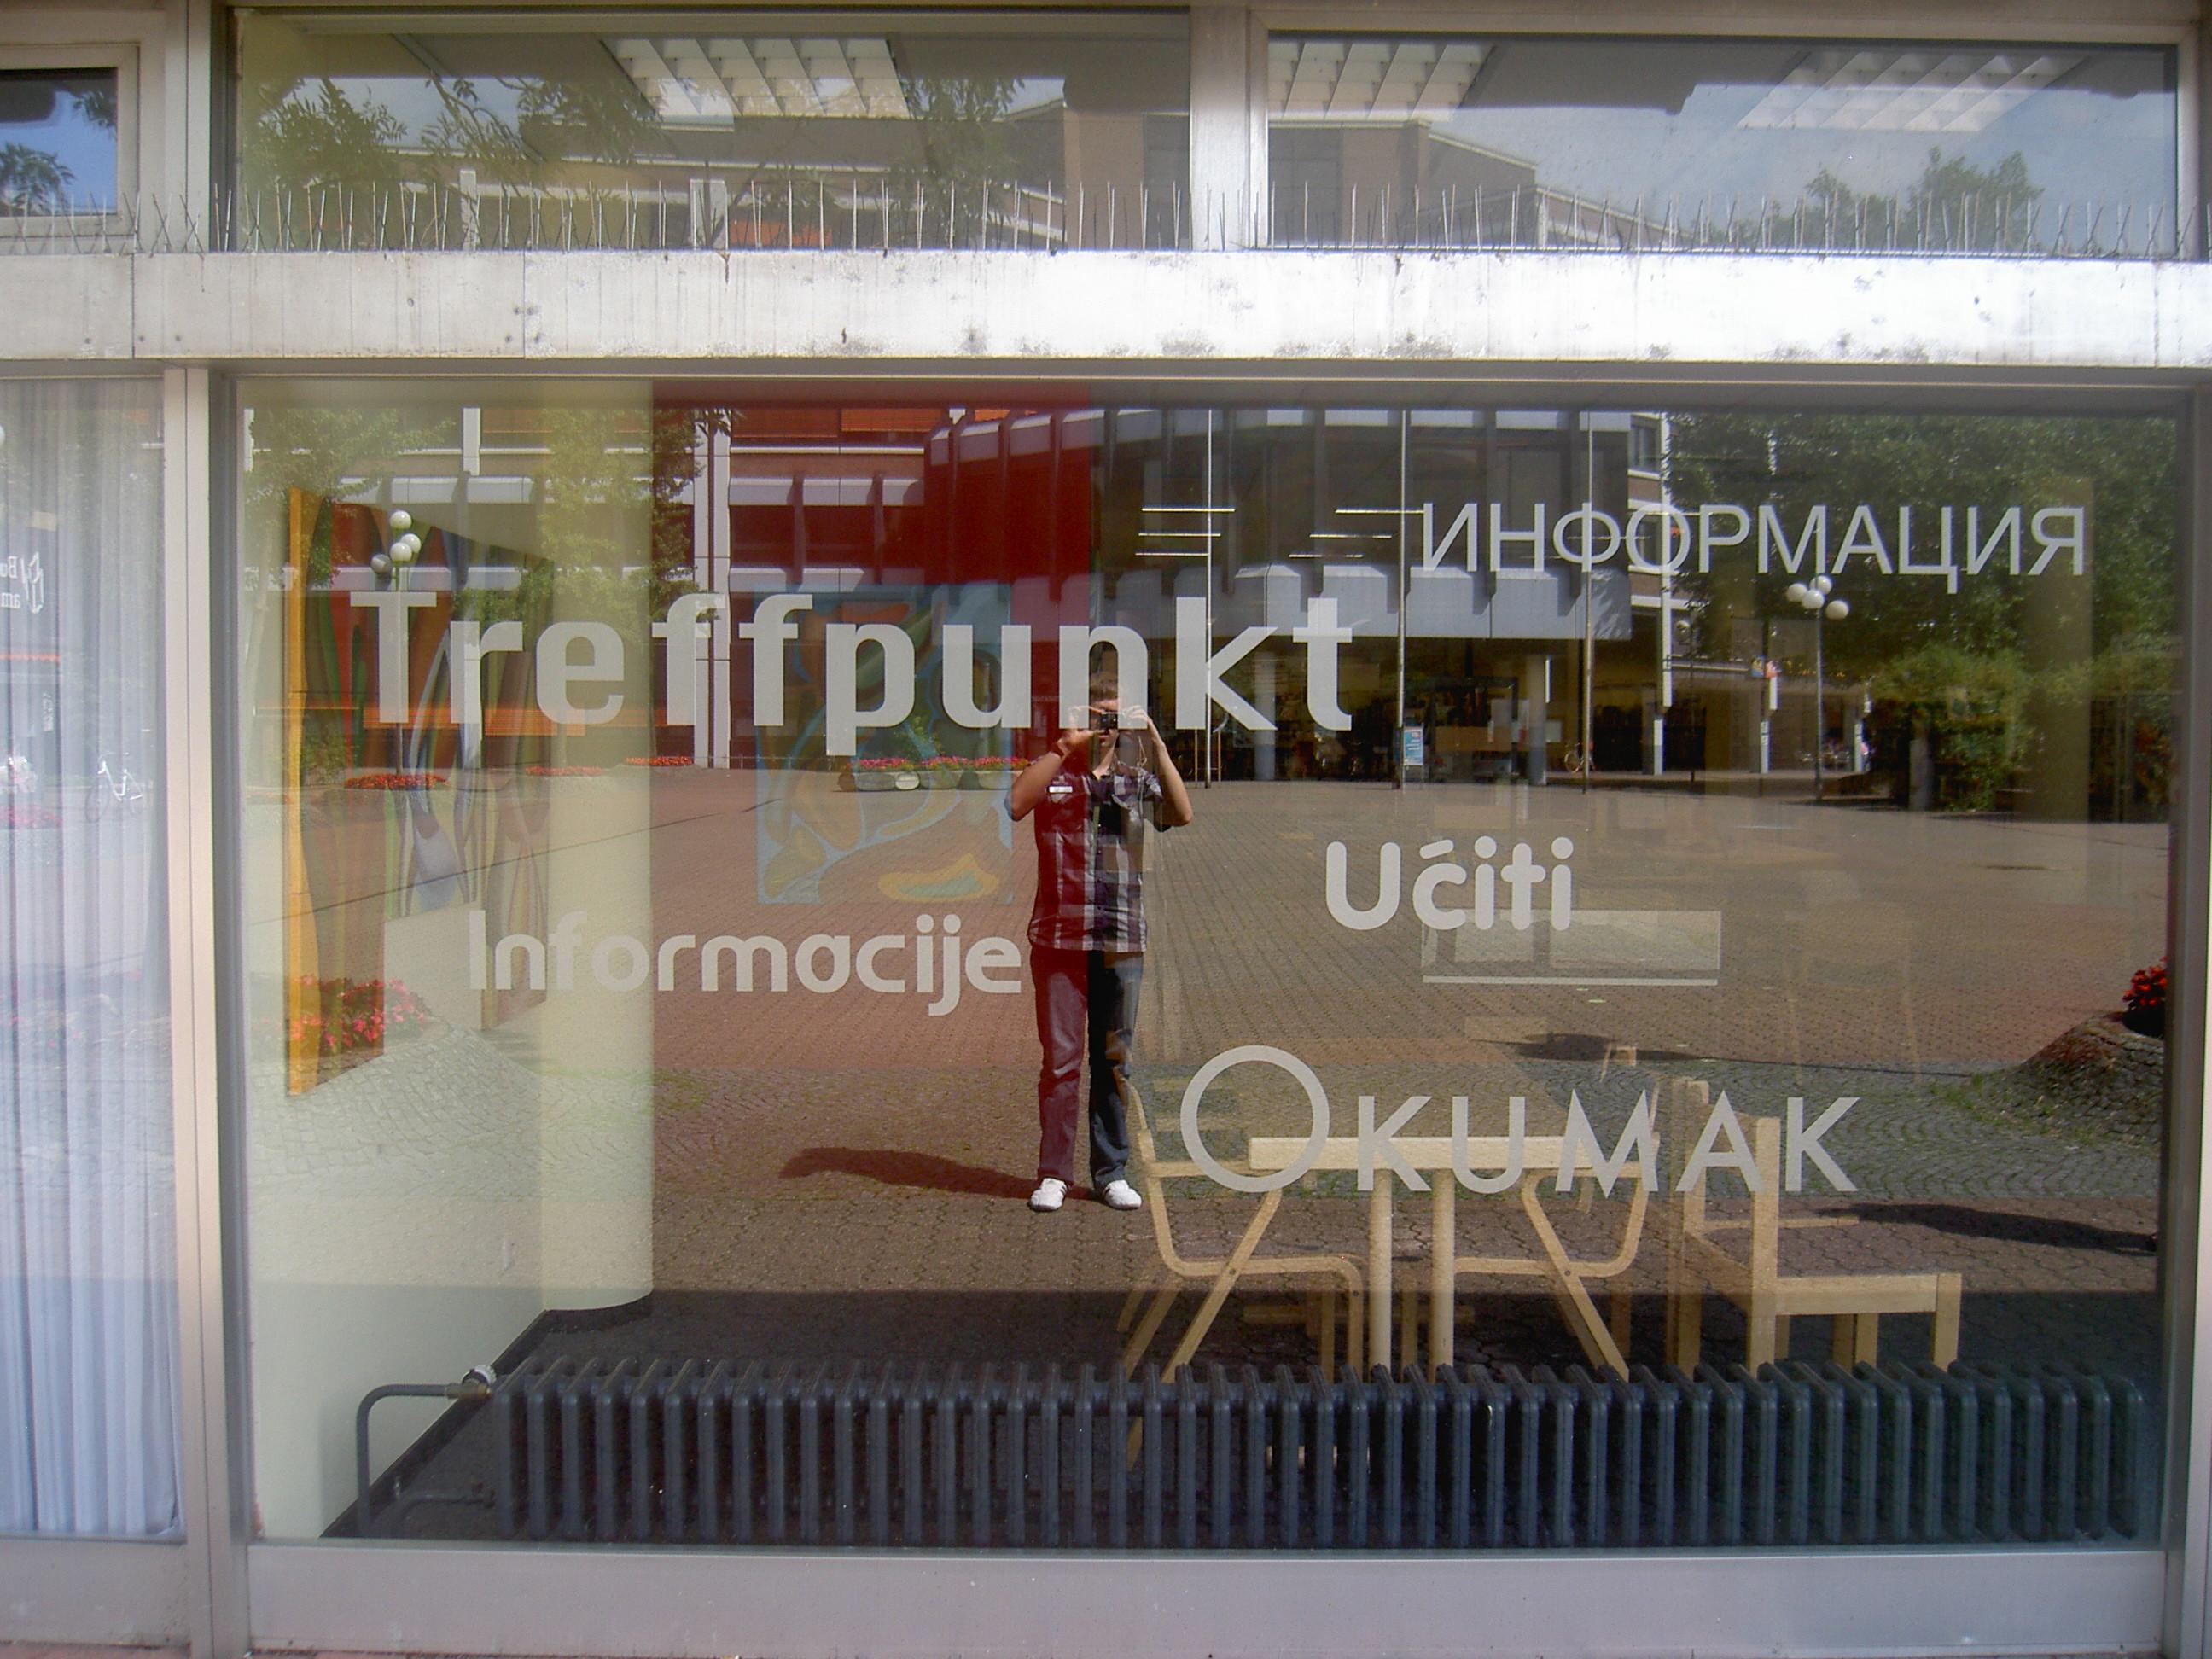 InfoTreff Stadtbücherei Kamp-Lintfort